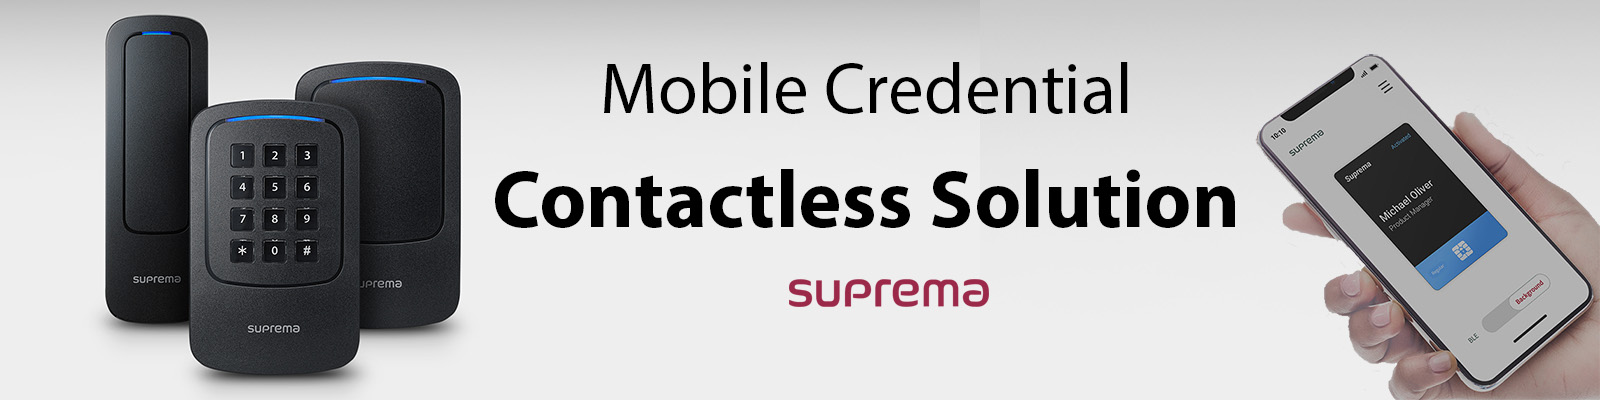 Suprema - Mobile Credential_Eng